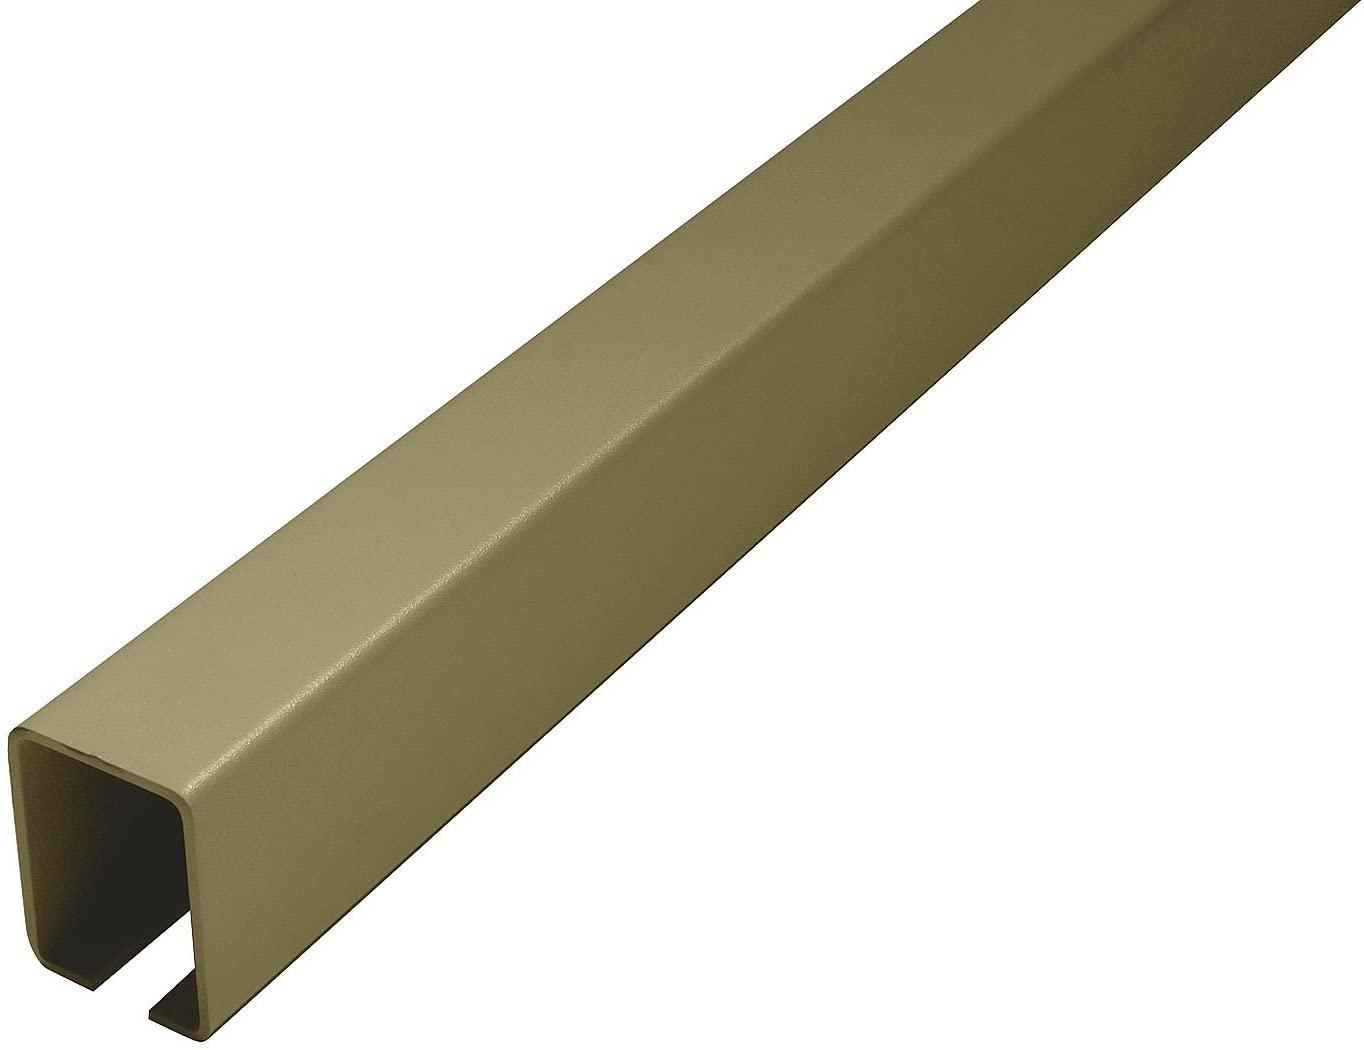 Richards-Wilcox - 2035.00804 - Conveyor Track, L10Ft, 11ga